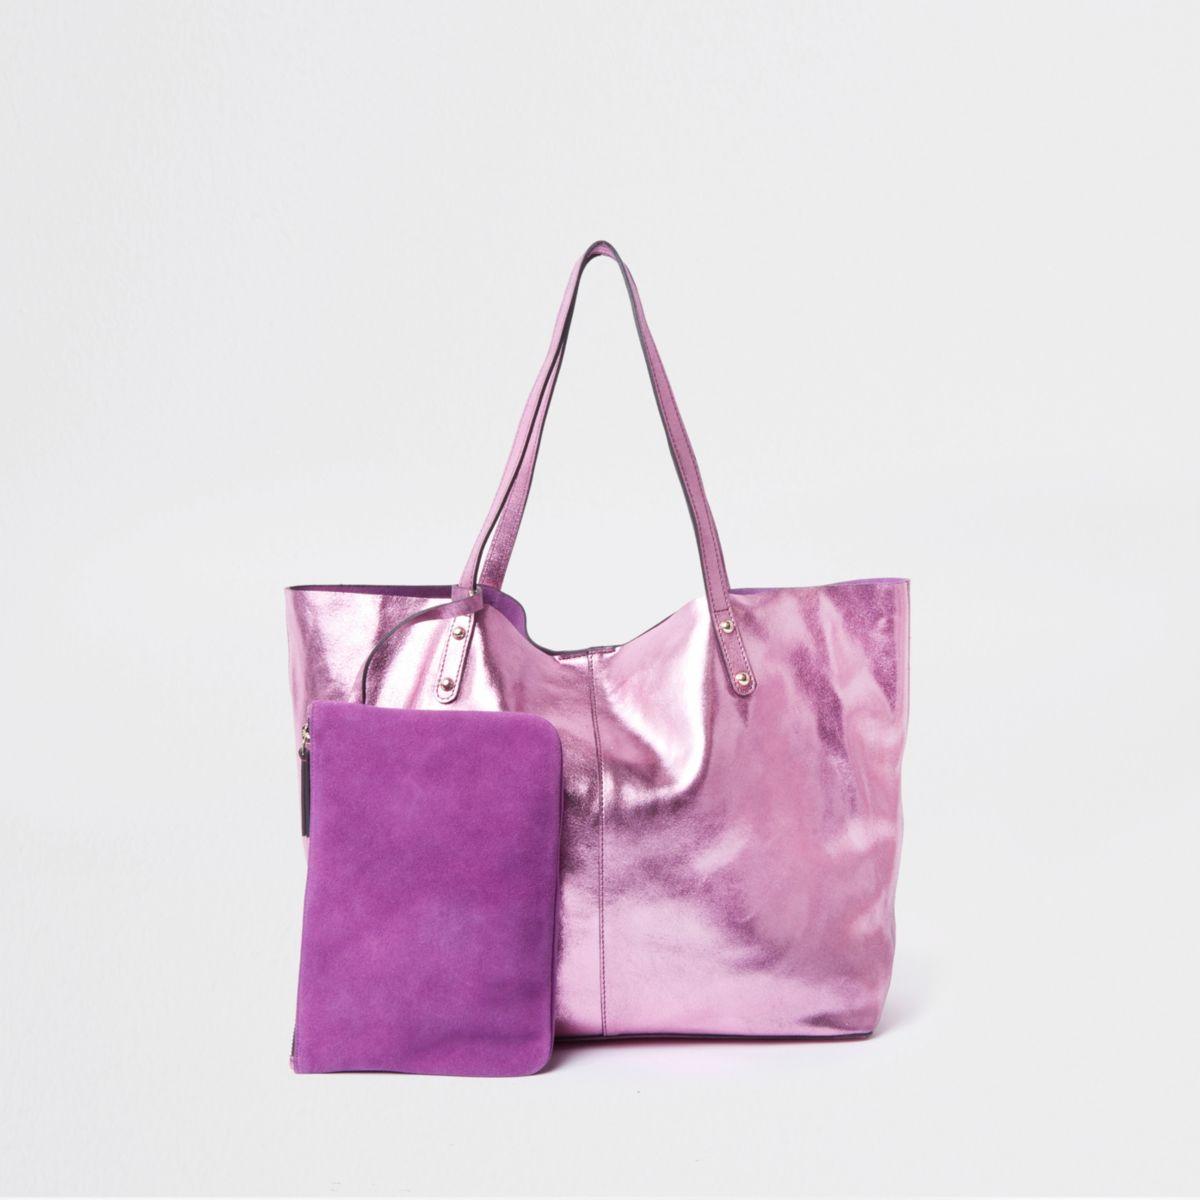 Pink leather metallic shopper tote bag